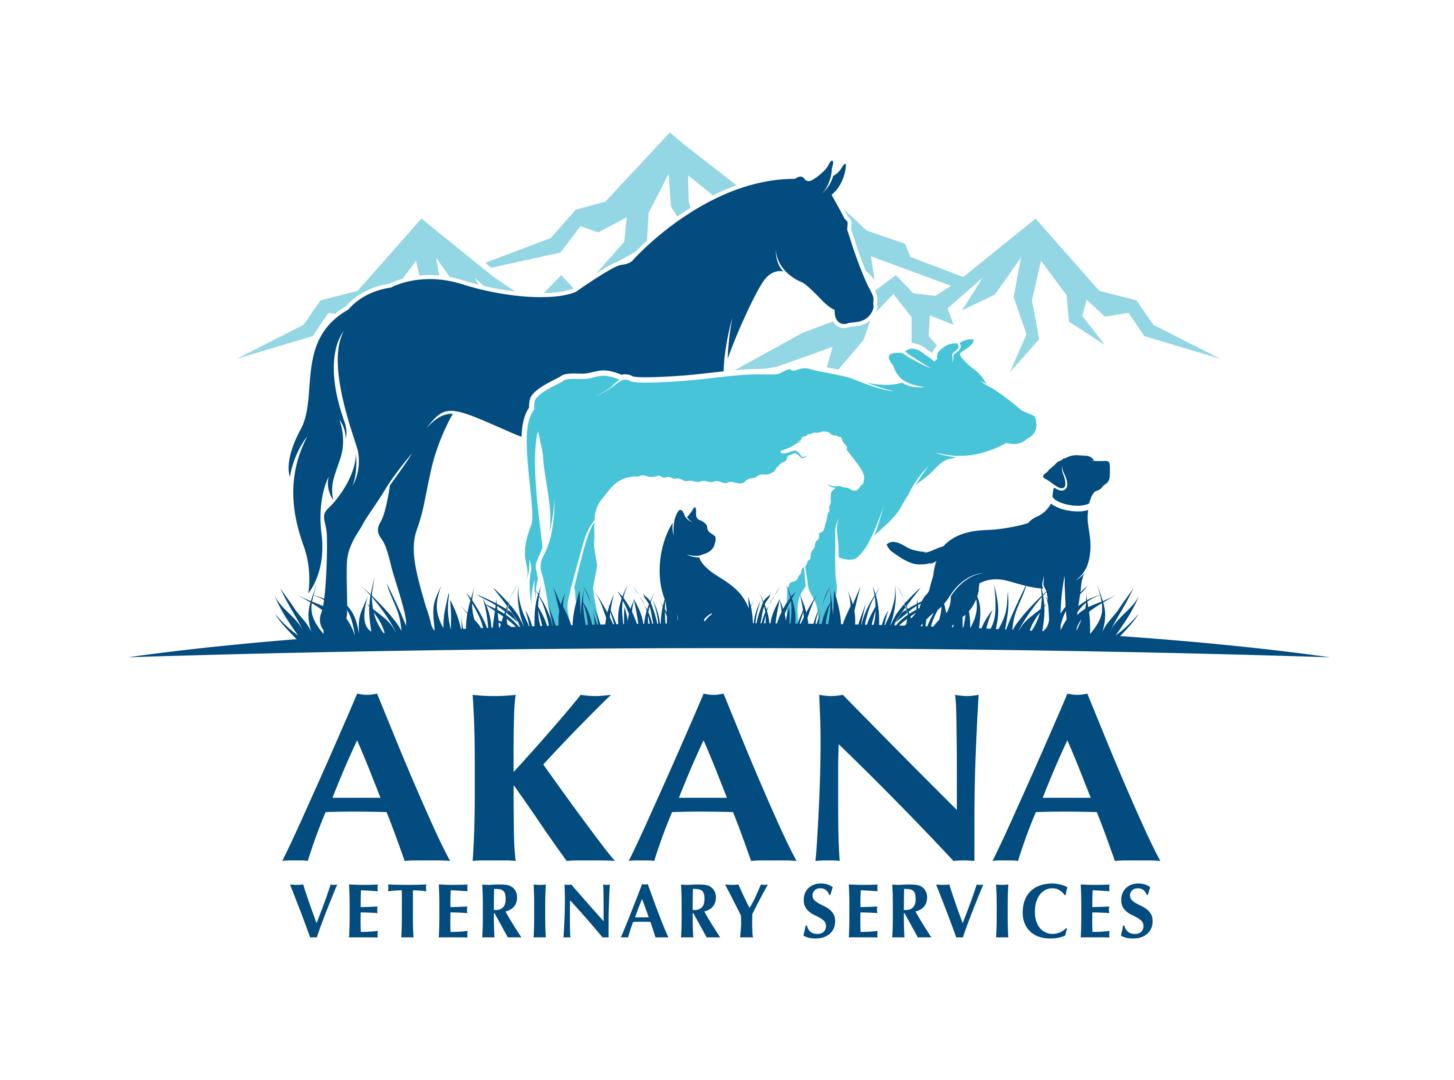 https://hawkmazzottamotocamp.com/wp-content/uploads/2021/03/Sponsor_Akana_Veterinary_Services-edited.png